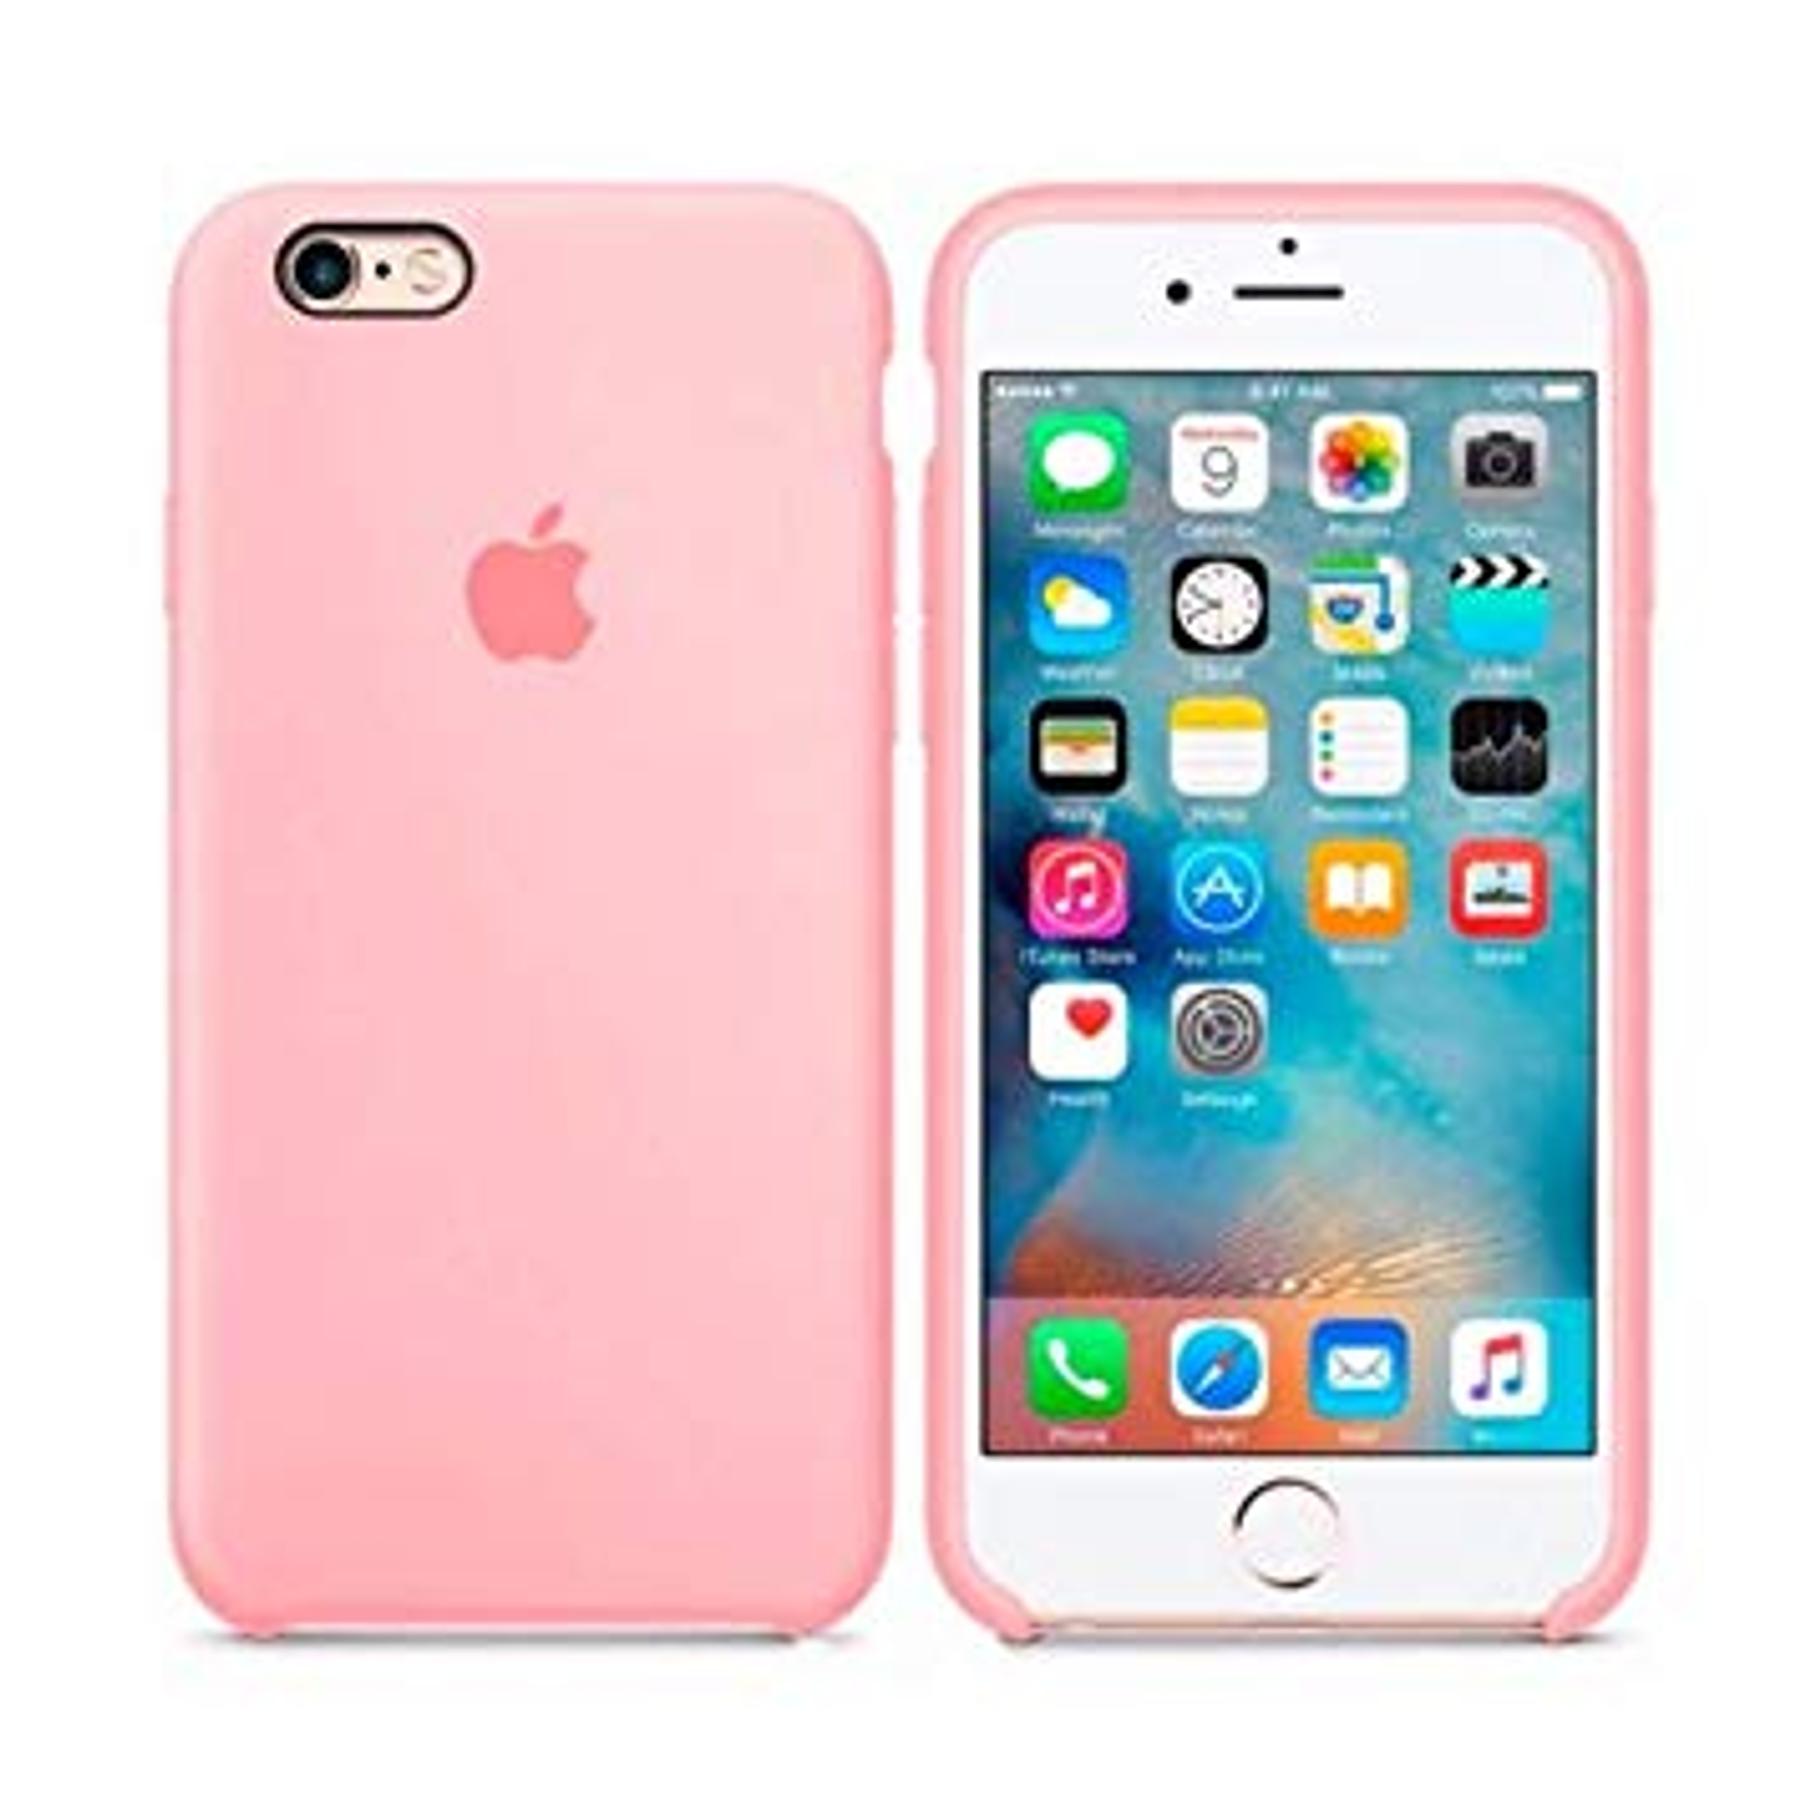 iPhone 6 / 6s - Carcasas